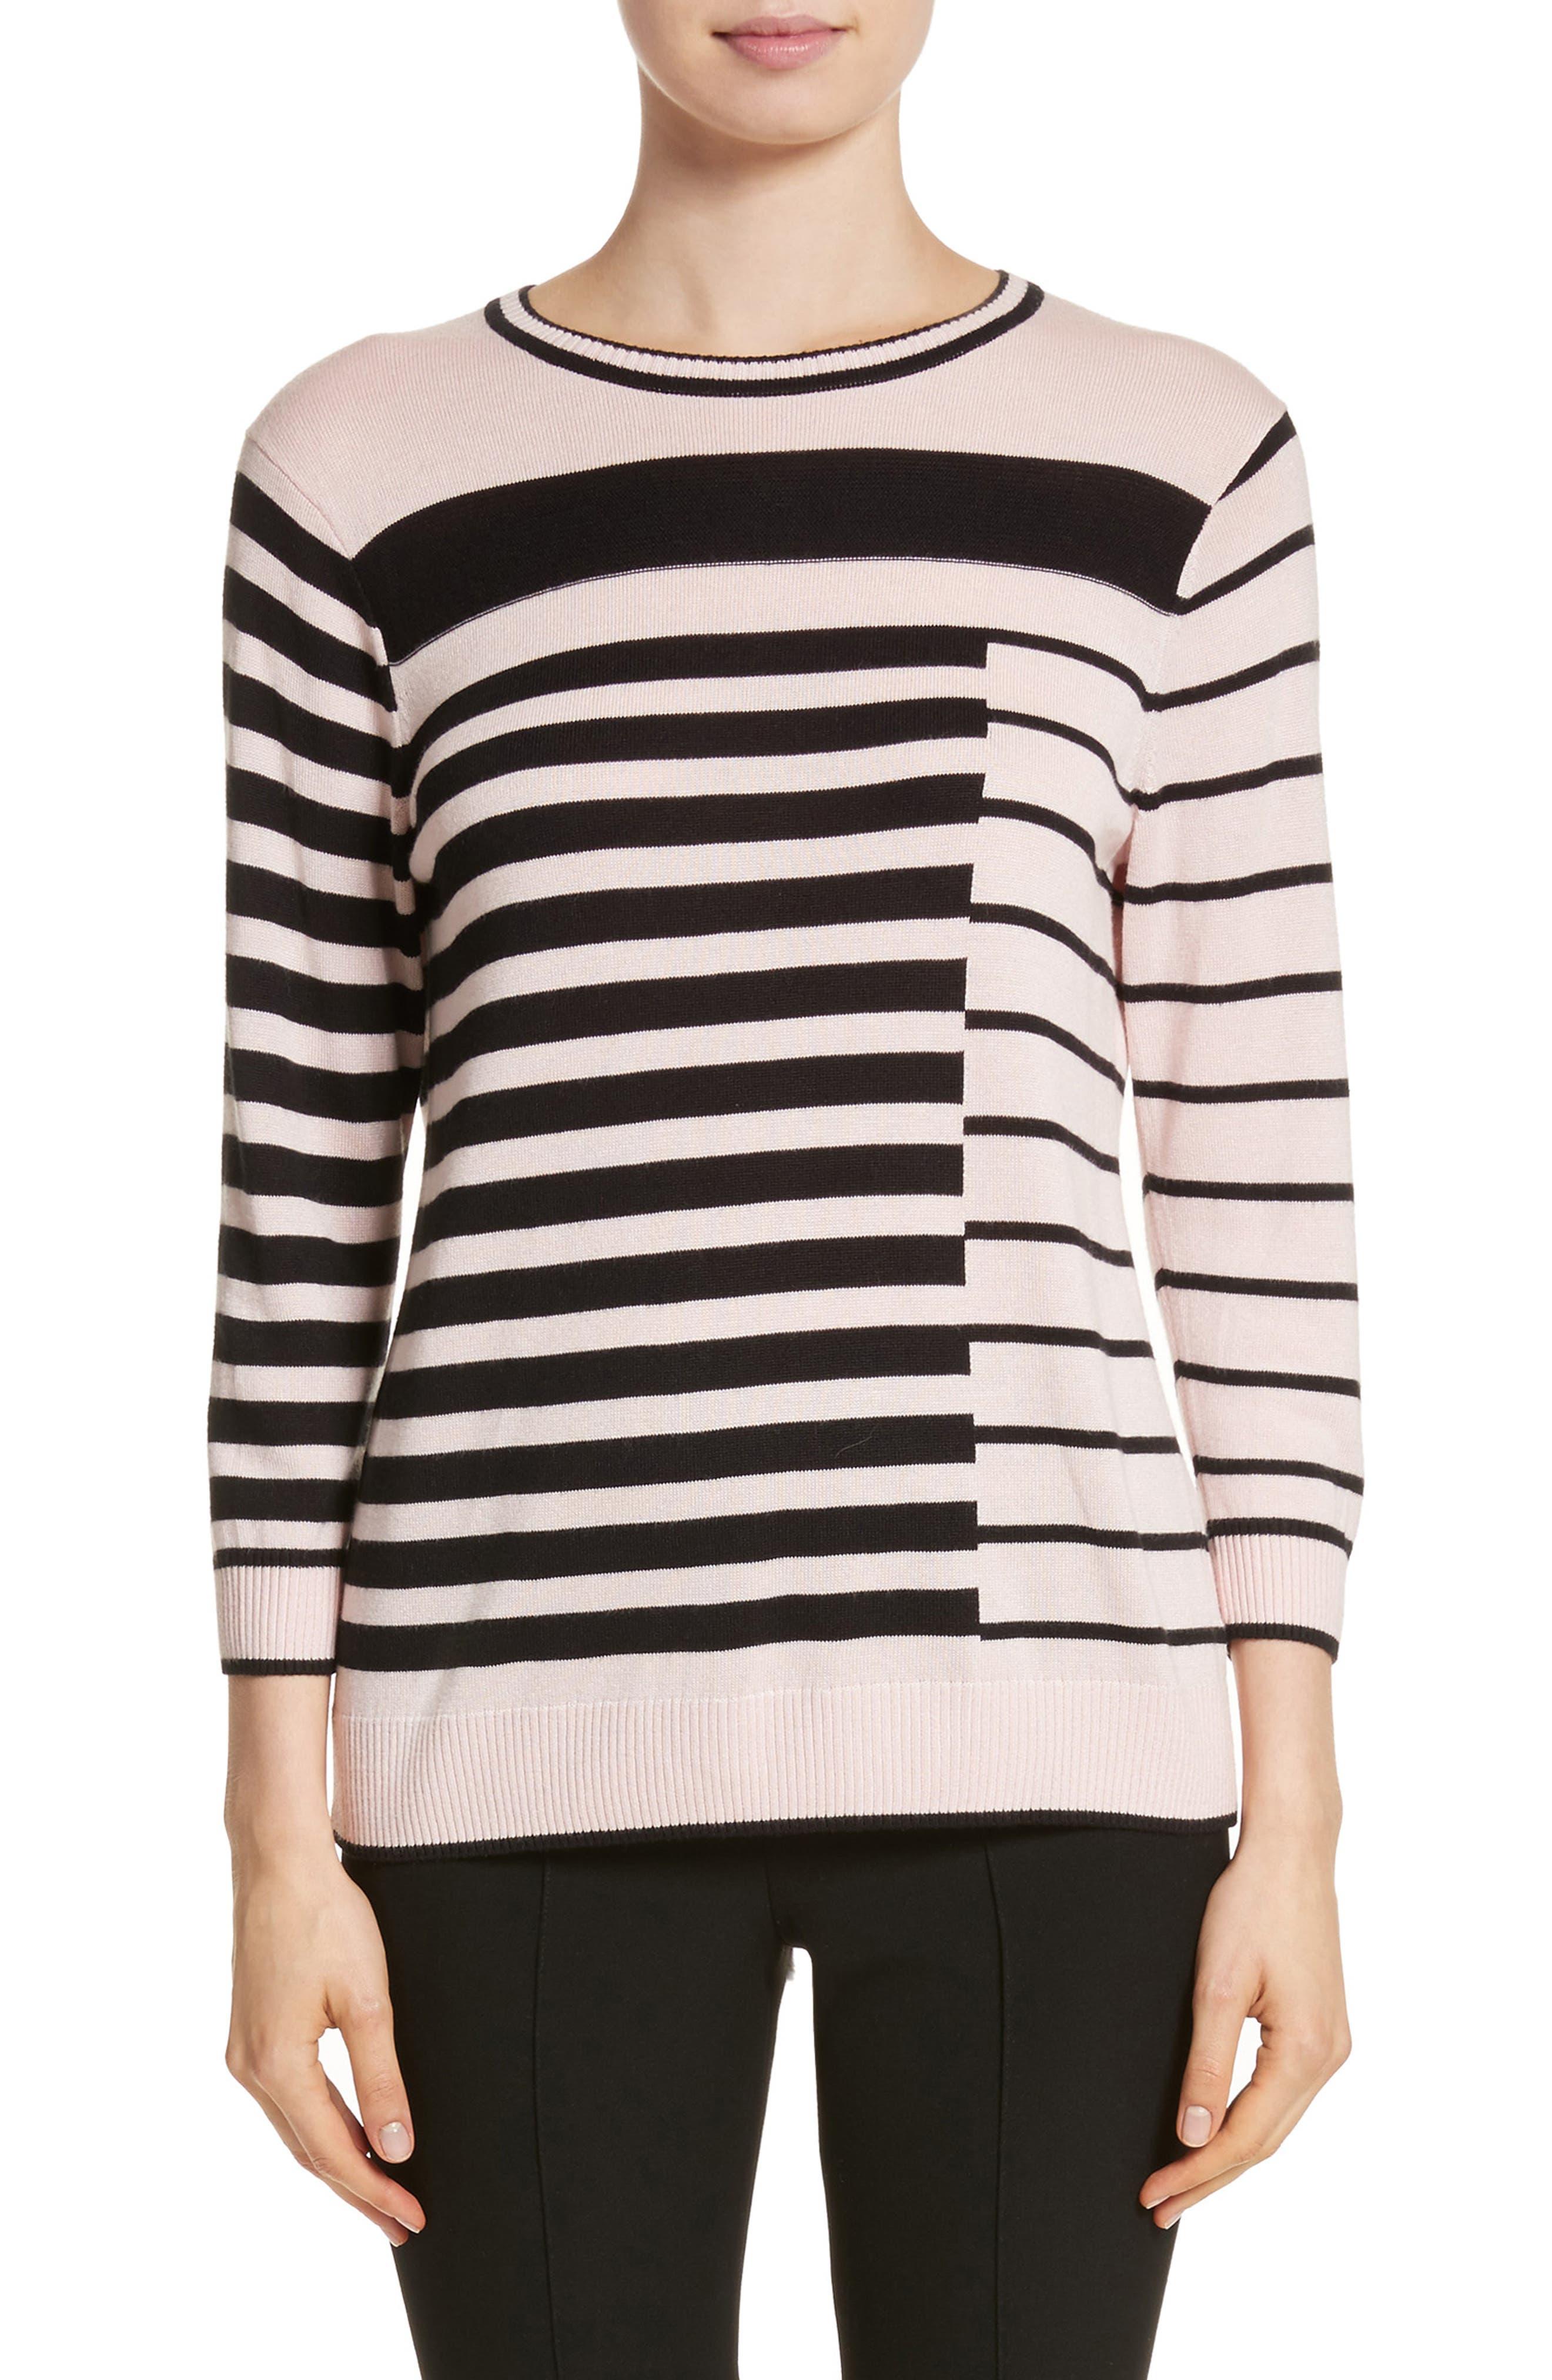 Main Image - St. John Collection Intarsia Stripe Sweater